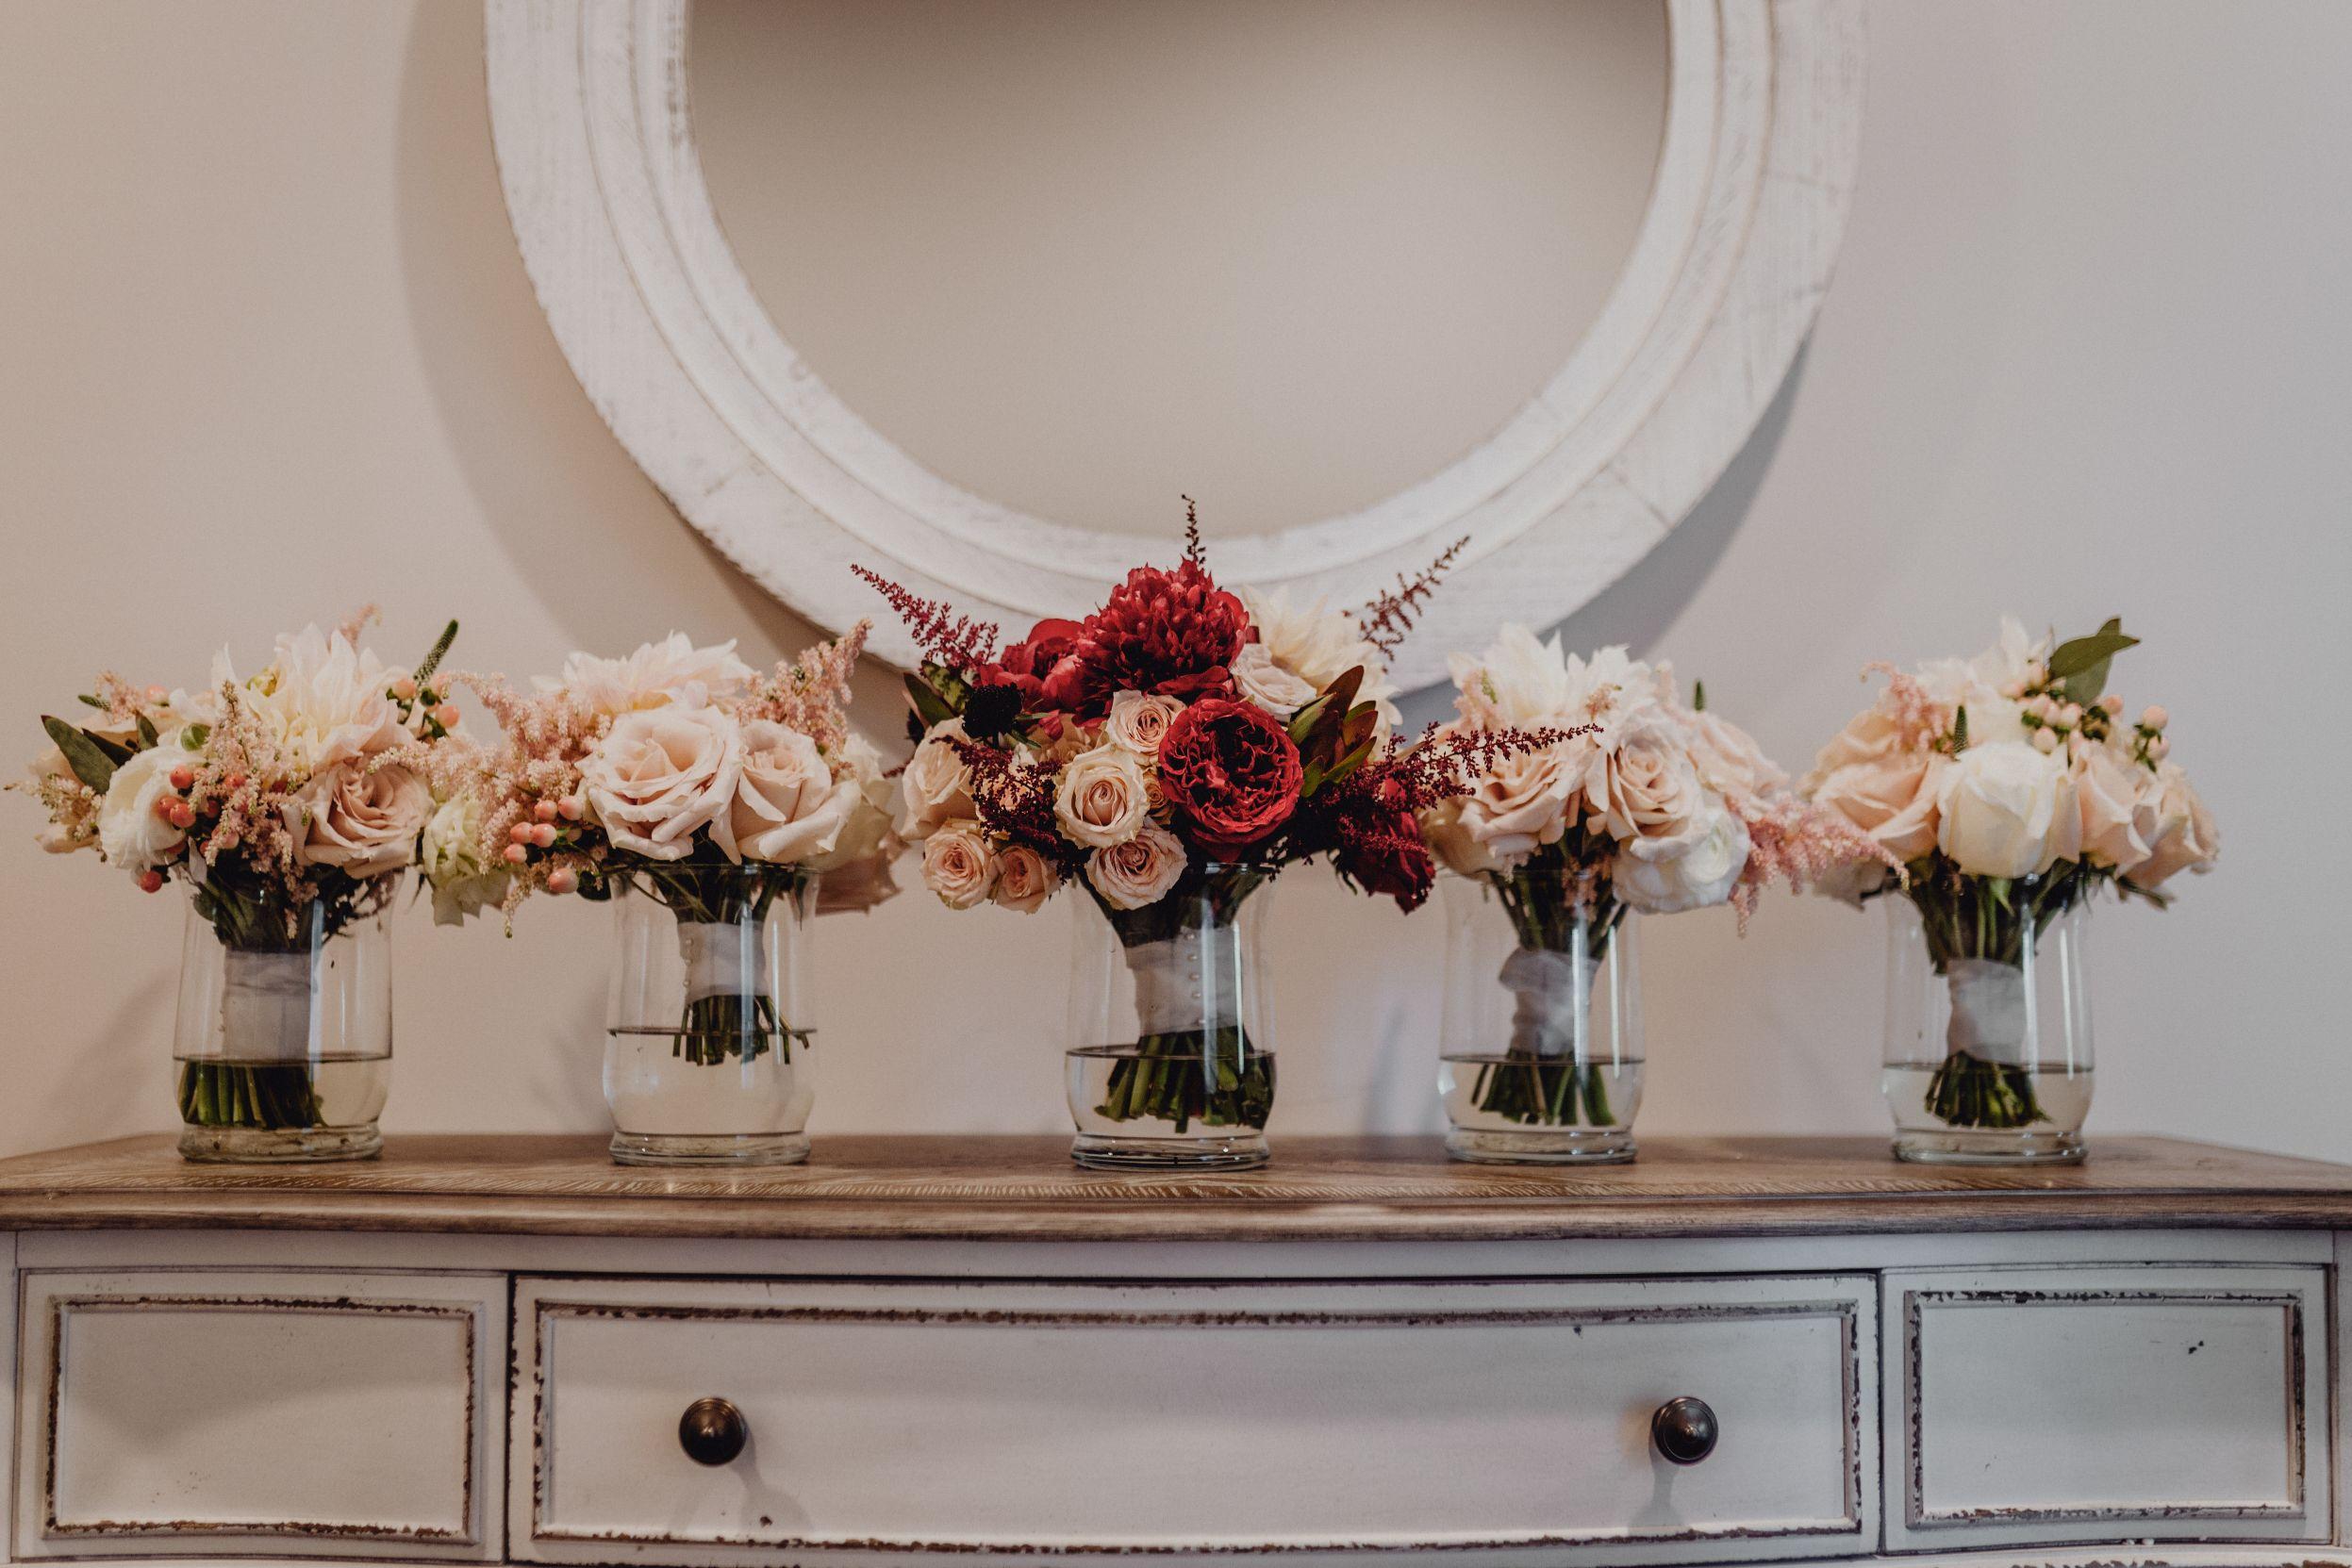 North-Dallas-Wedding-Florist-David-Co.-1.jpg